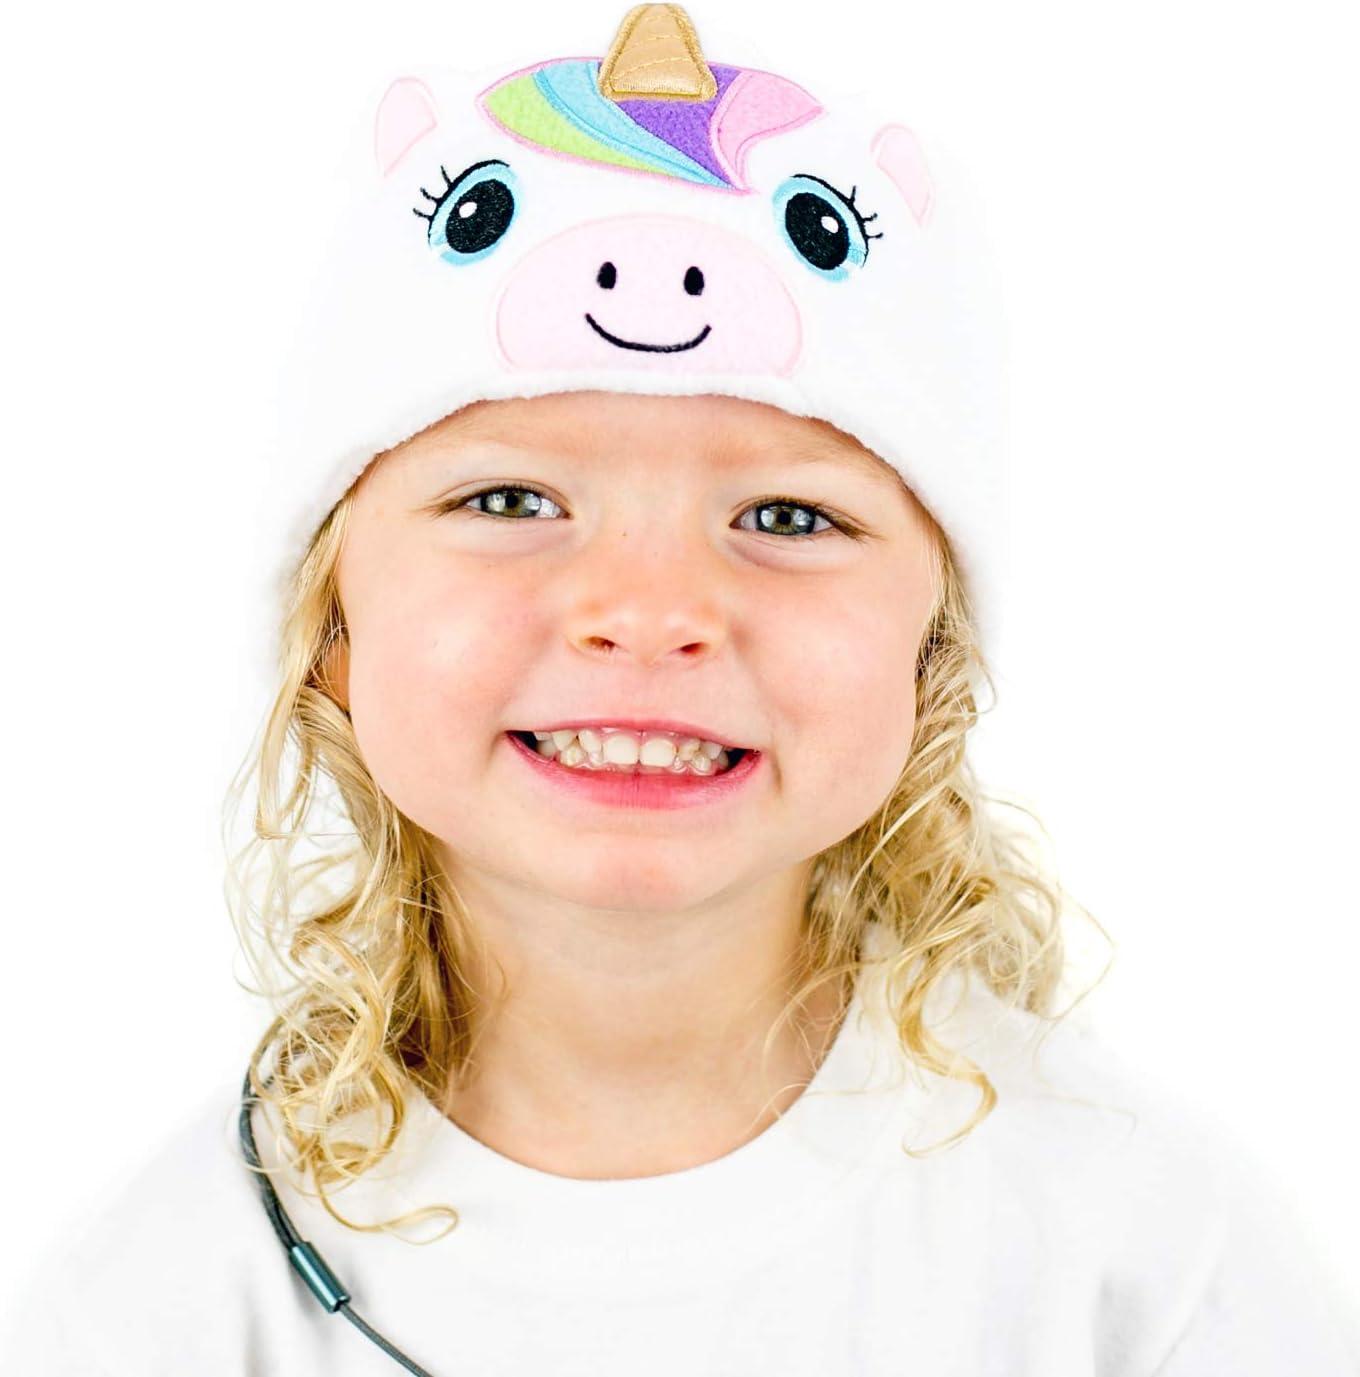 CozyPhones Over The Ear Headband Headphones - Kids Headphones Volume Limited with Thin Speakers & Super Soft Stretchy Headband - White Unicorn